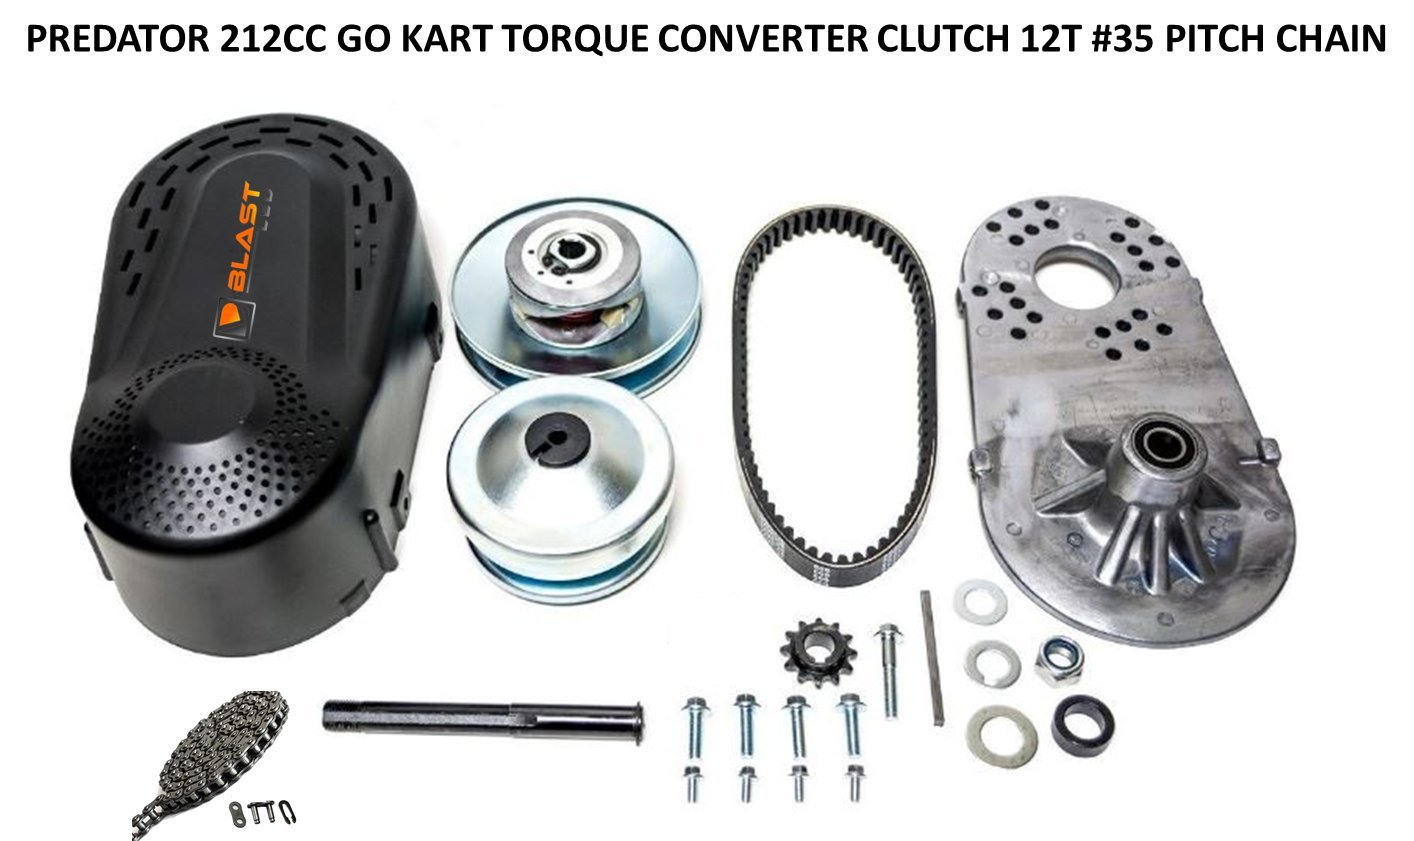 BLAST LED - Predator 212CC GO Kart Torque Converter Clutch 35 Pitch 12 Tooth 19.05mm 3/4'' Bore + 5 FEET #35 Pitch Chain & 12T #35 Sprocket